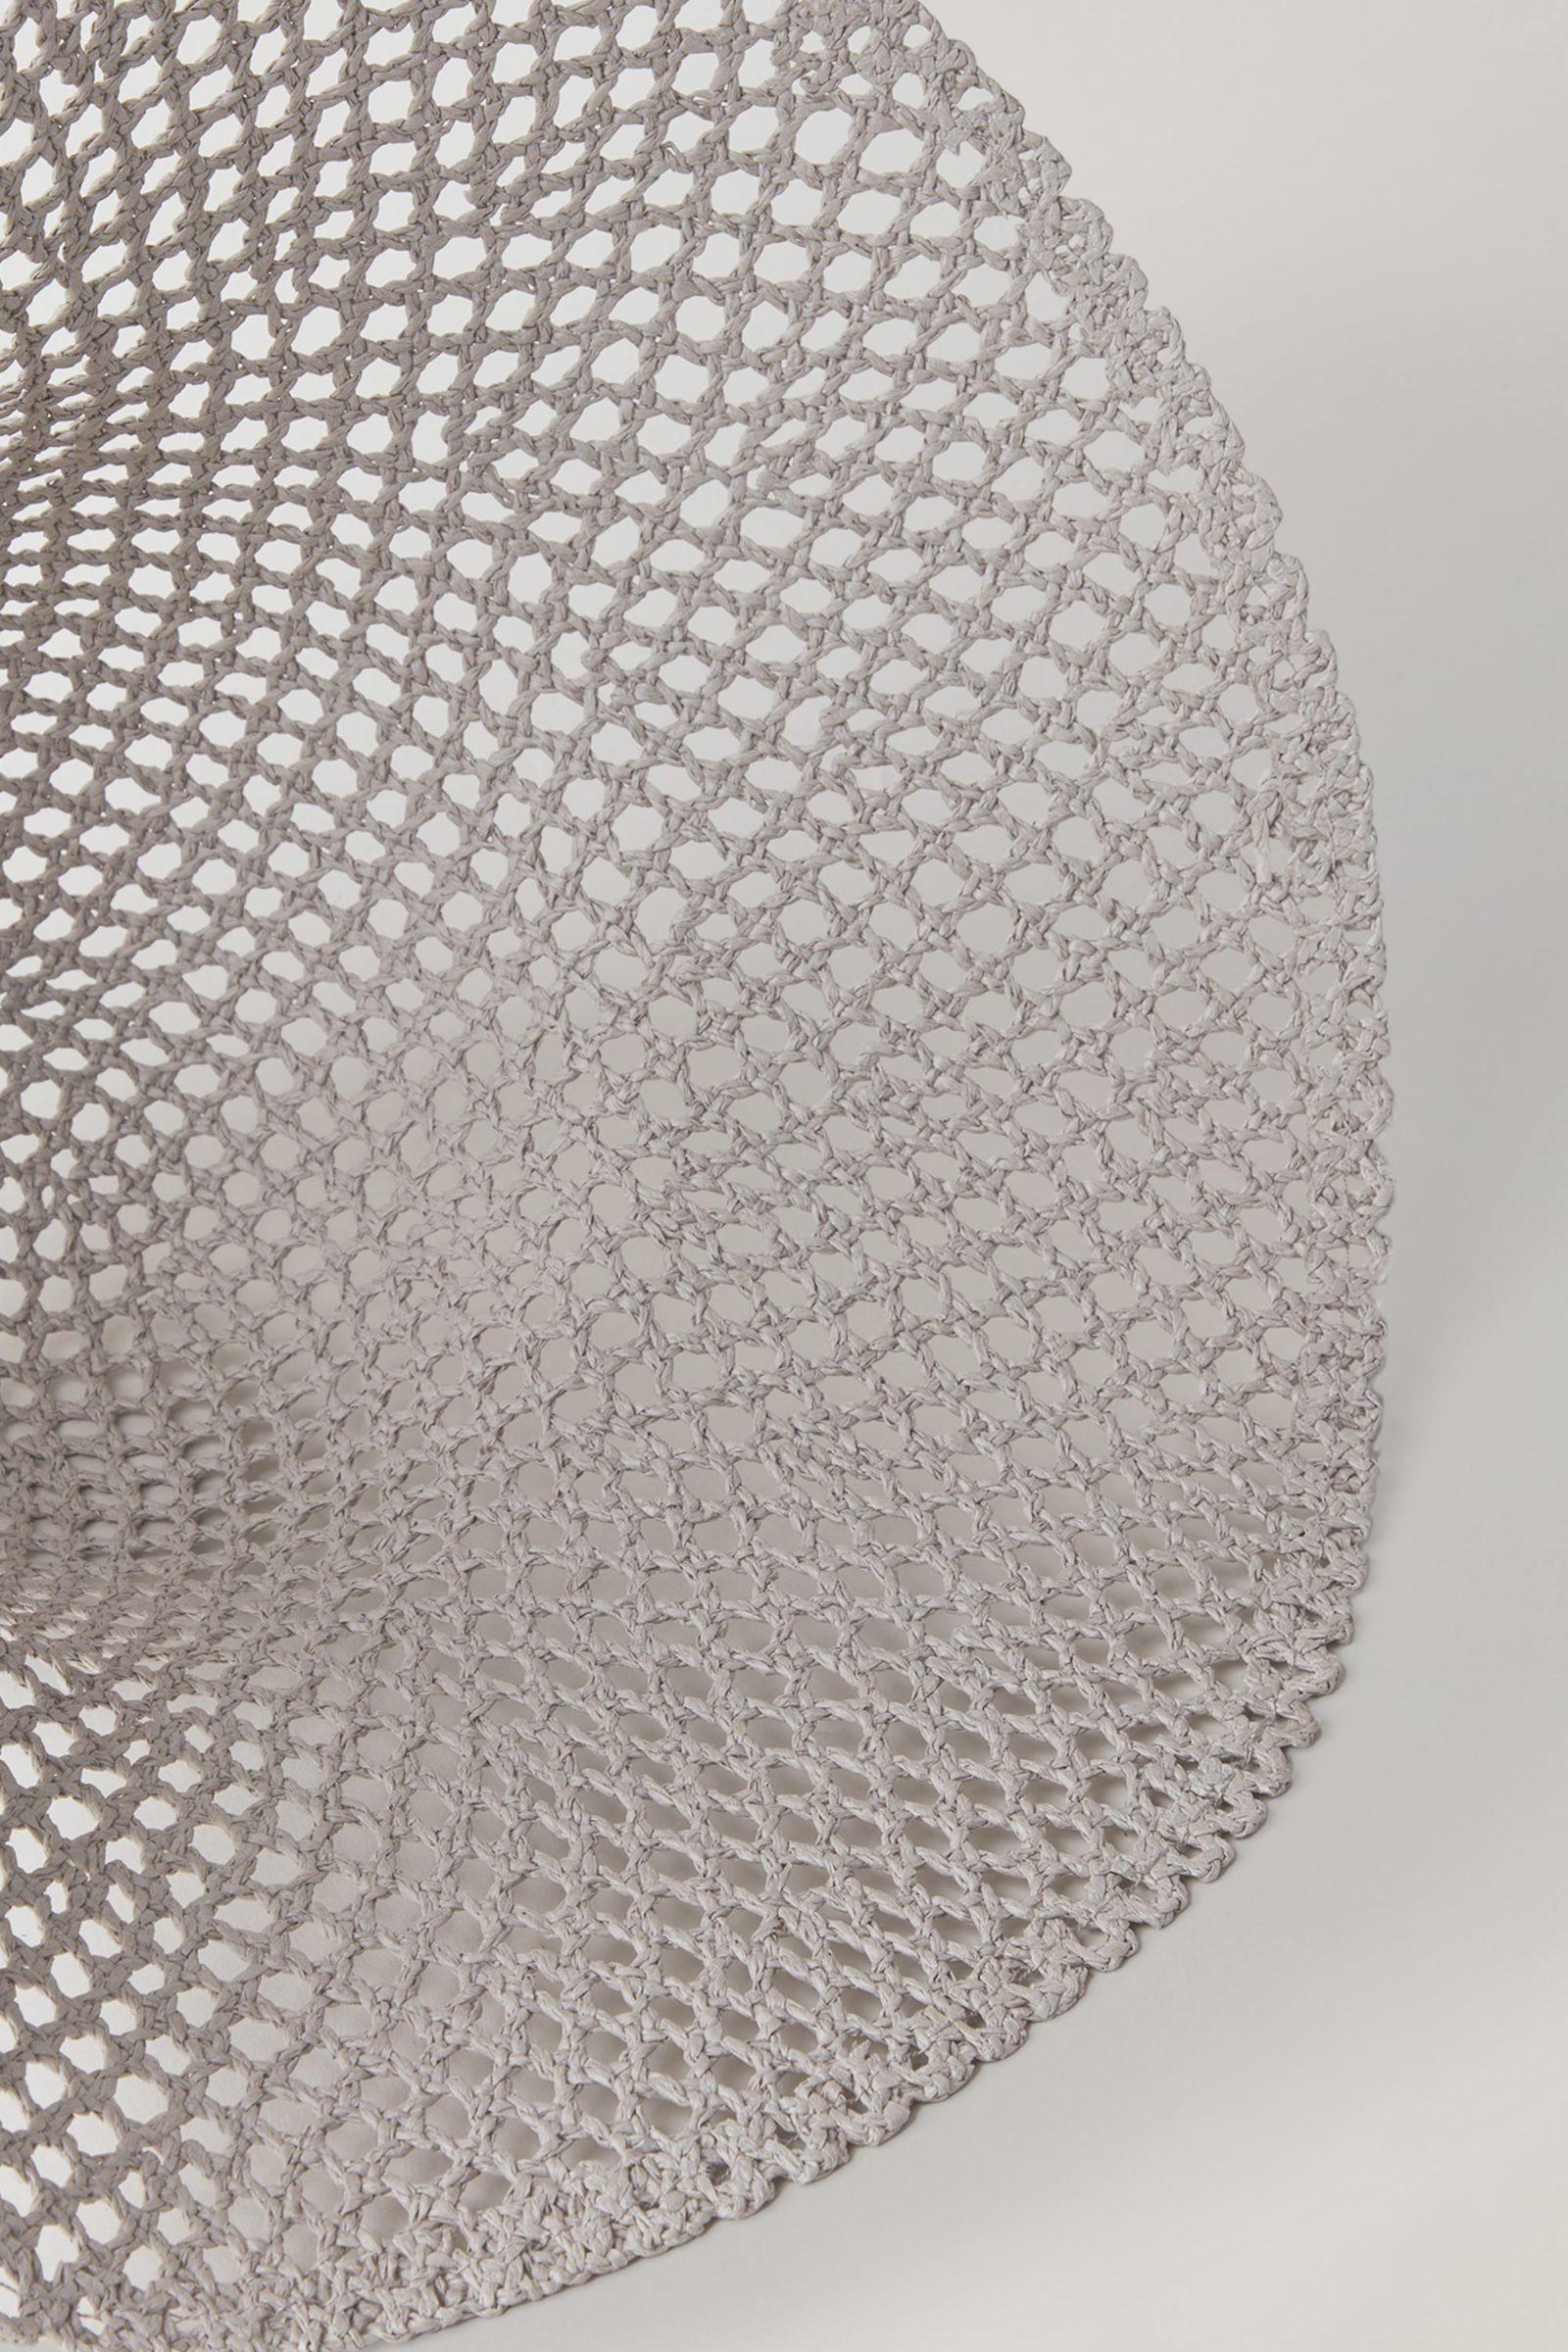 COS 브로드리 앙글레이즈 패턴드 햇의 베이지컬러 Detail입니다.